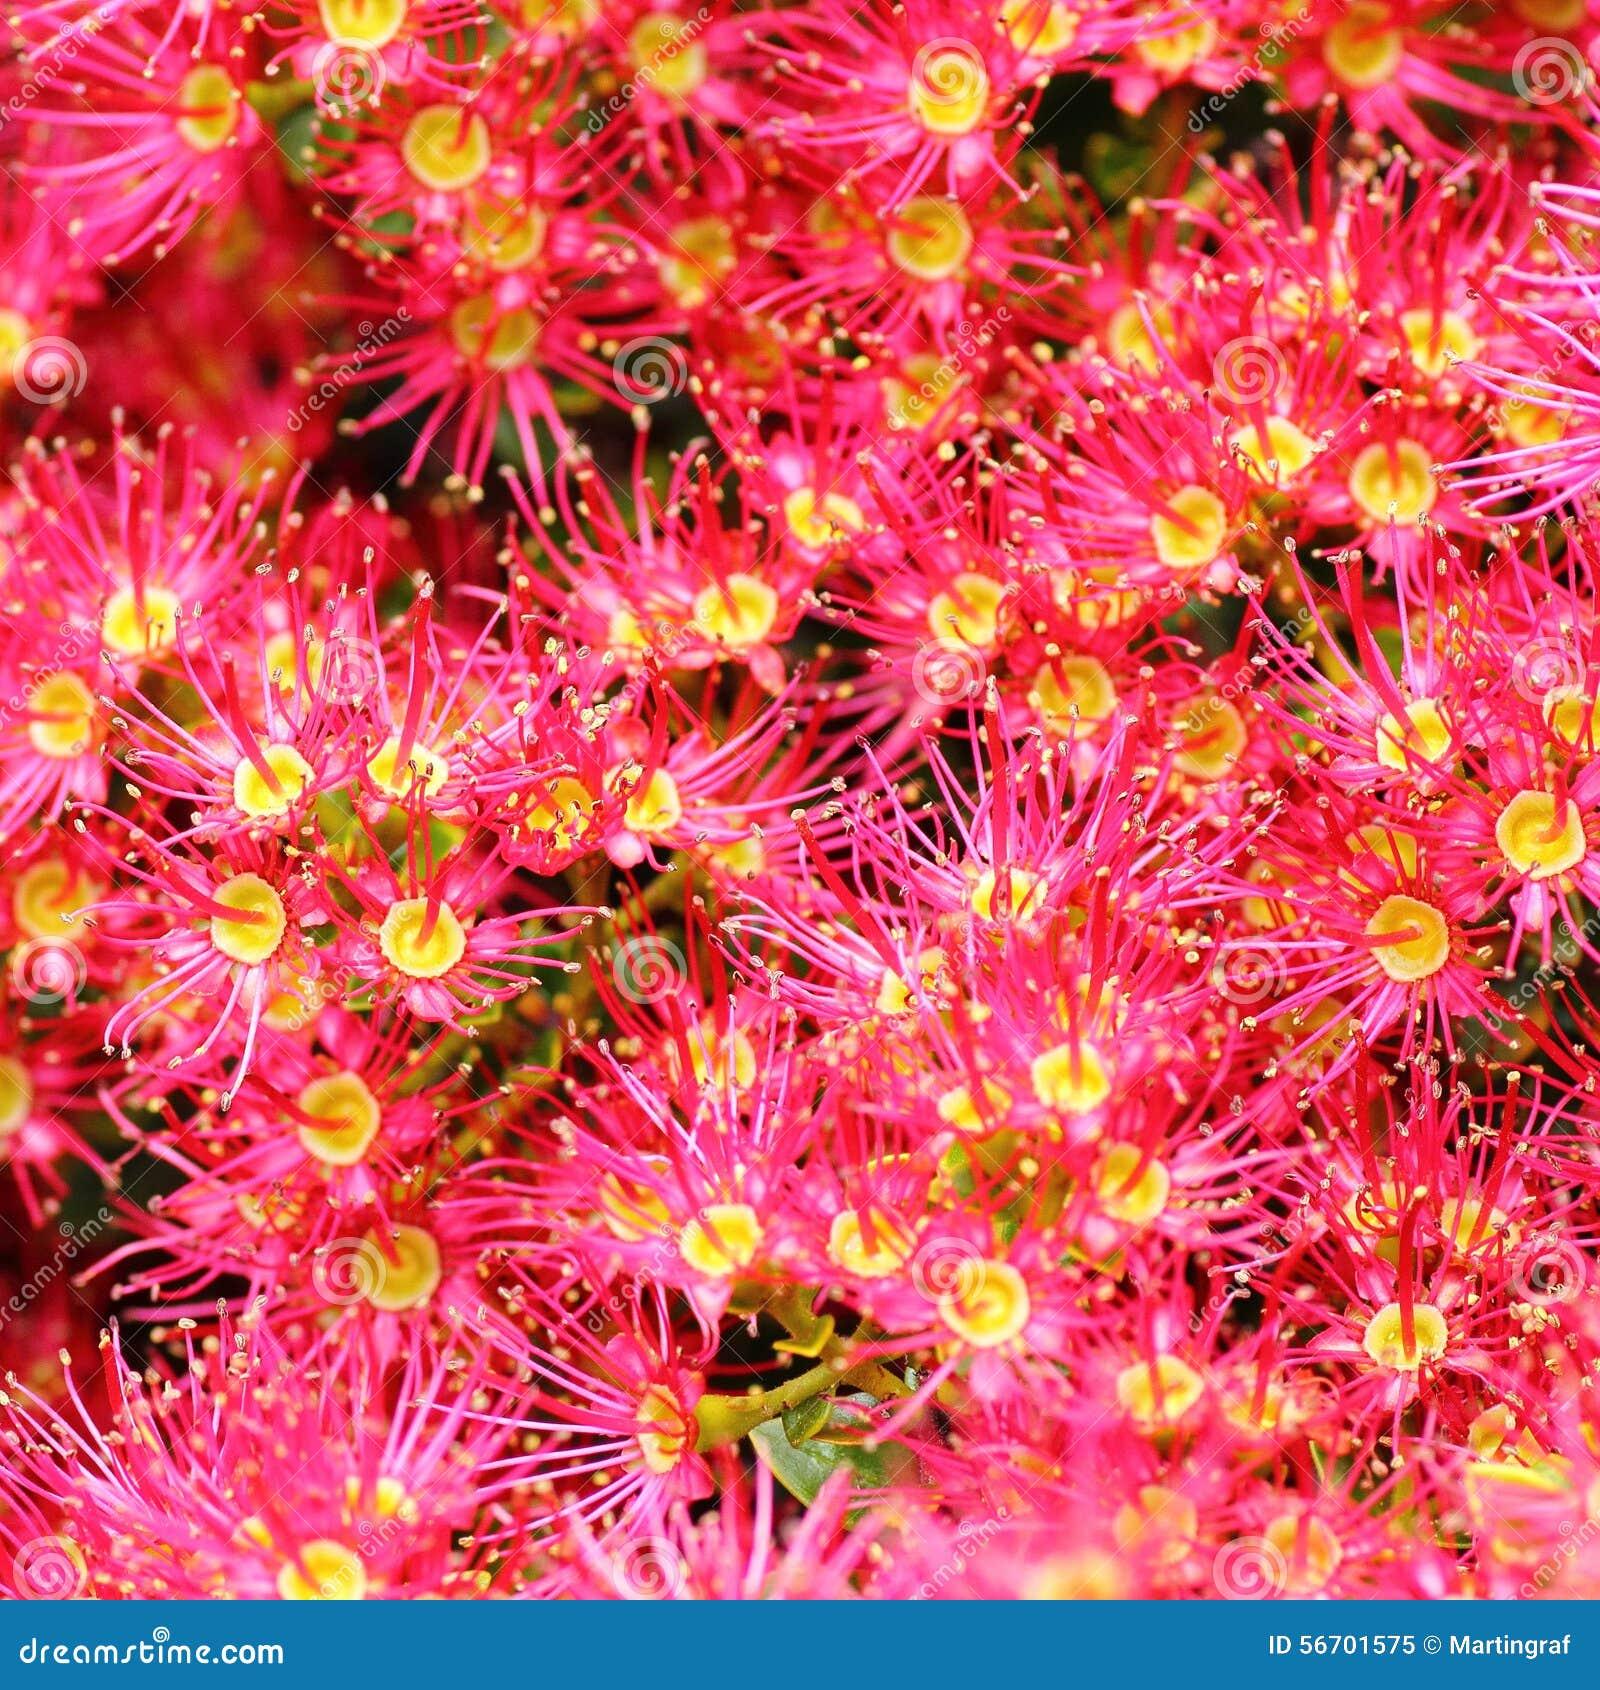 Pink Bloom Eucalyptus Flowers Stock Photo